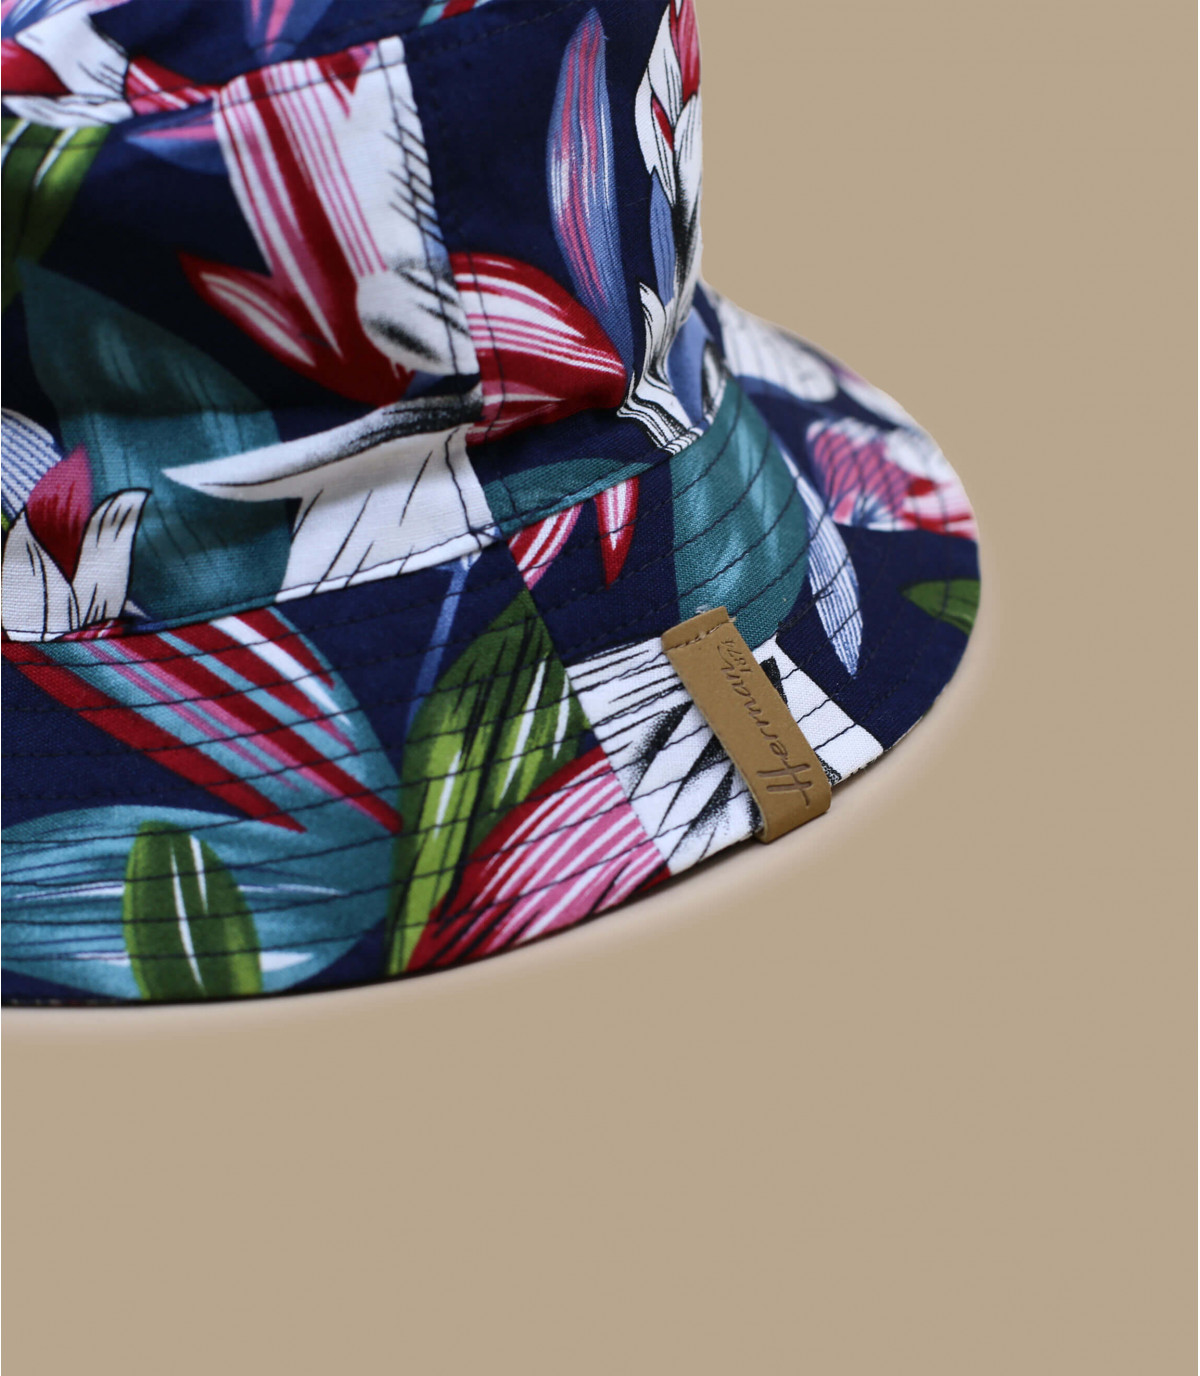 Dettagli Bucket Floral navy - image 2